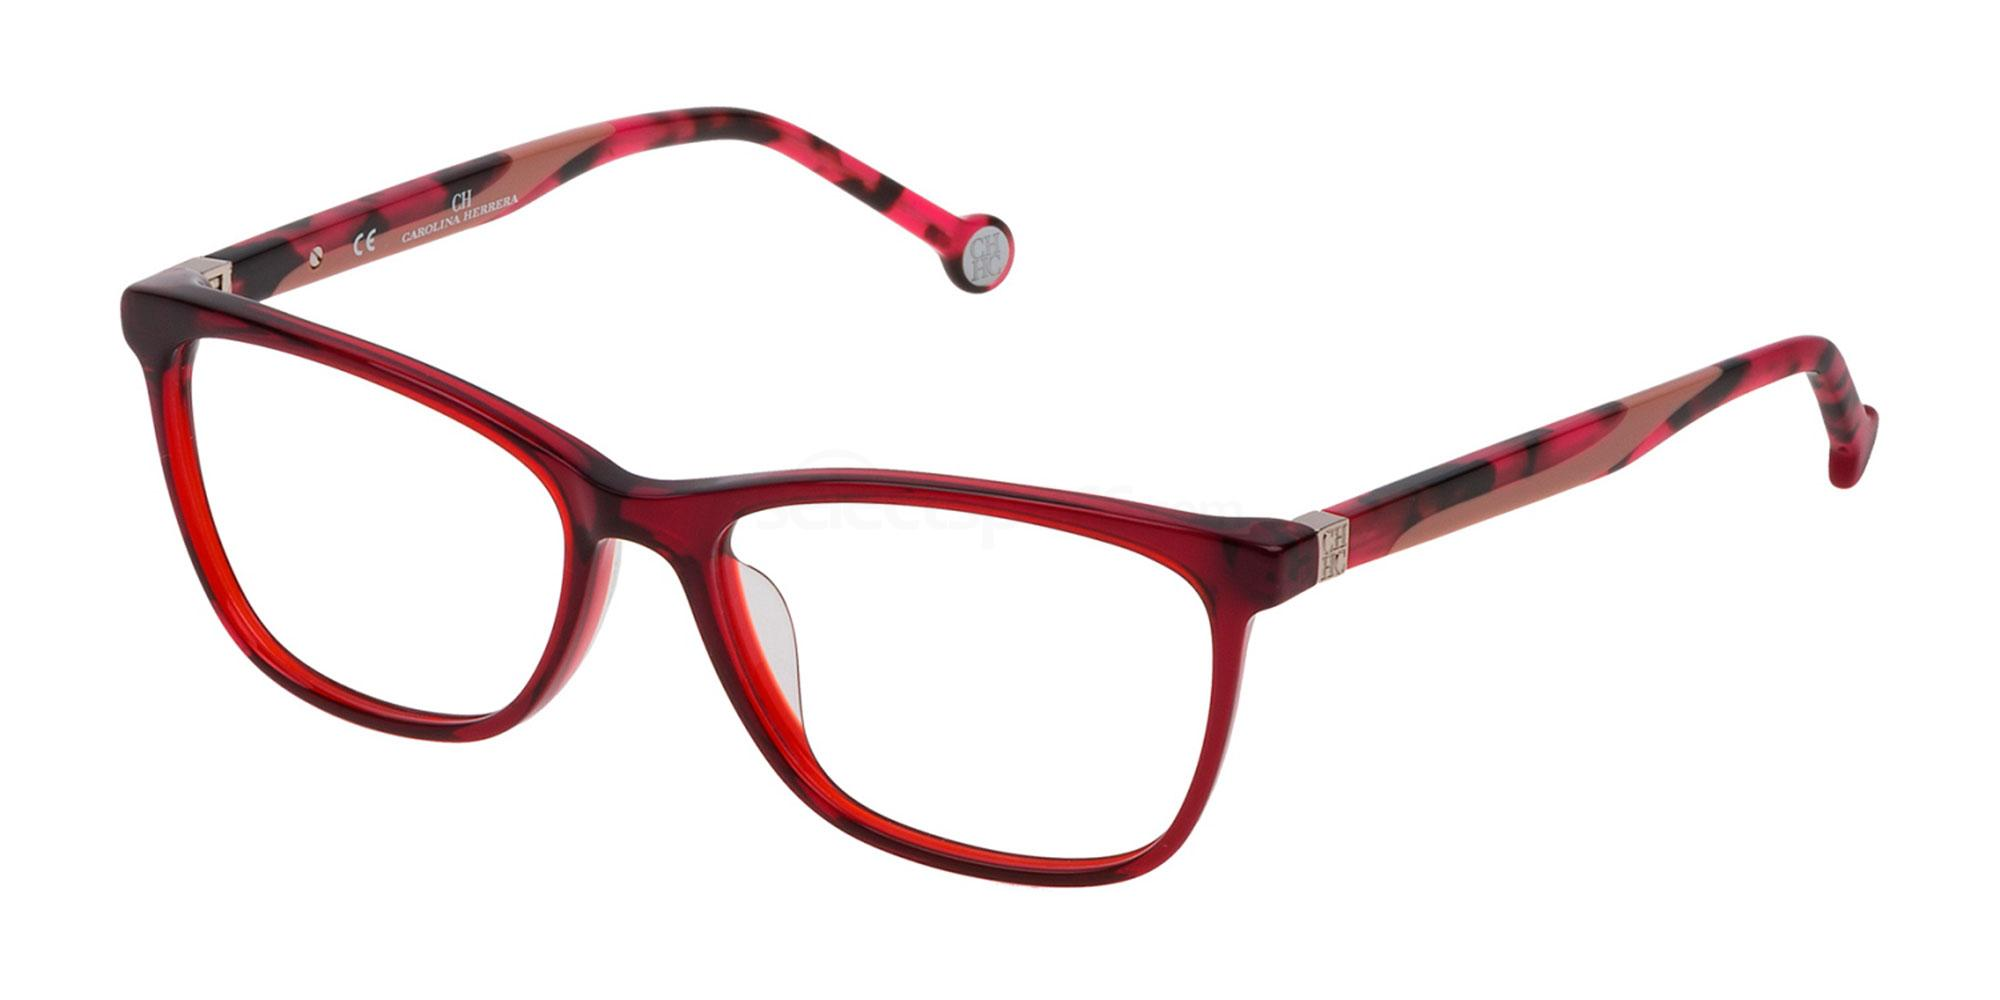 06DC VHE771 Glasses, CH Carolina Herrera